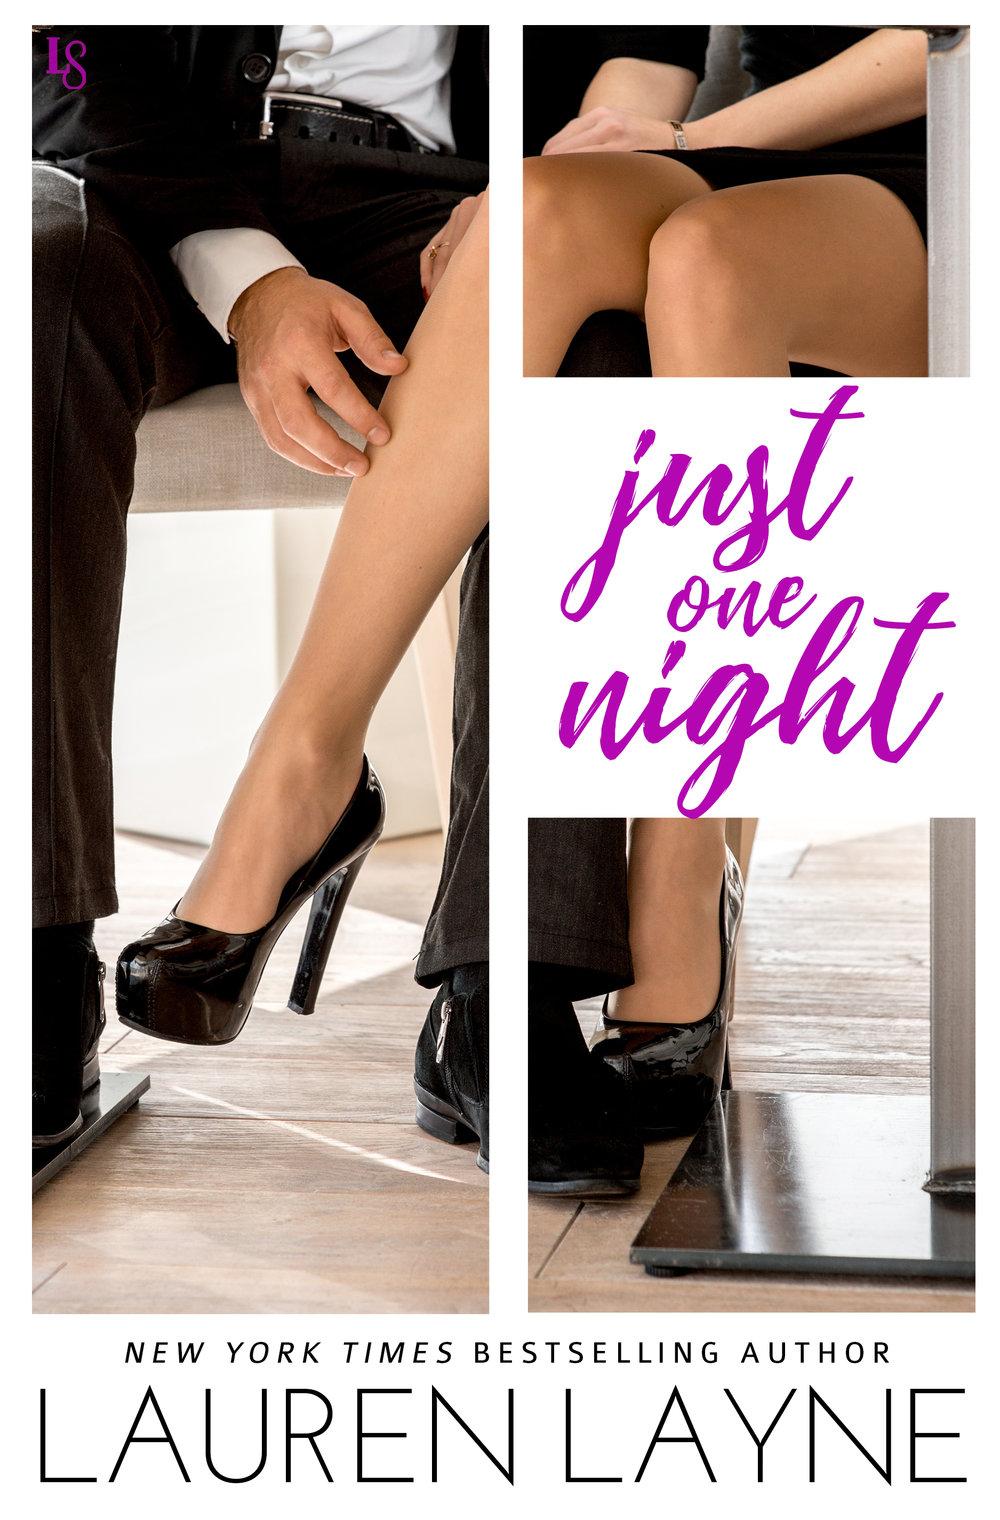 Just One Night by Lauren Layne